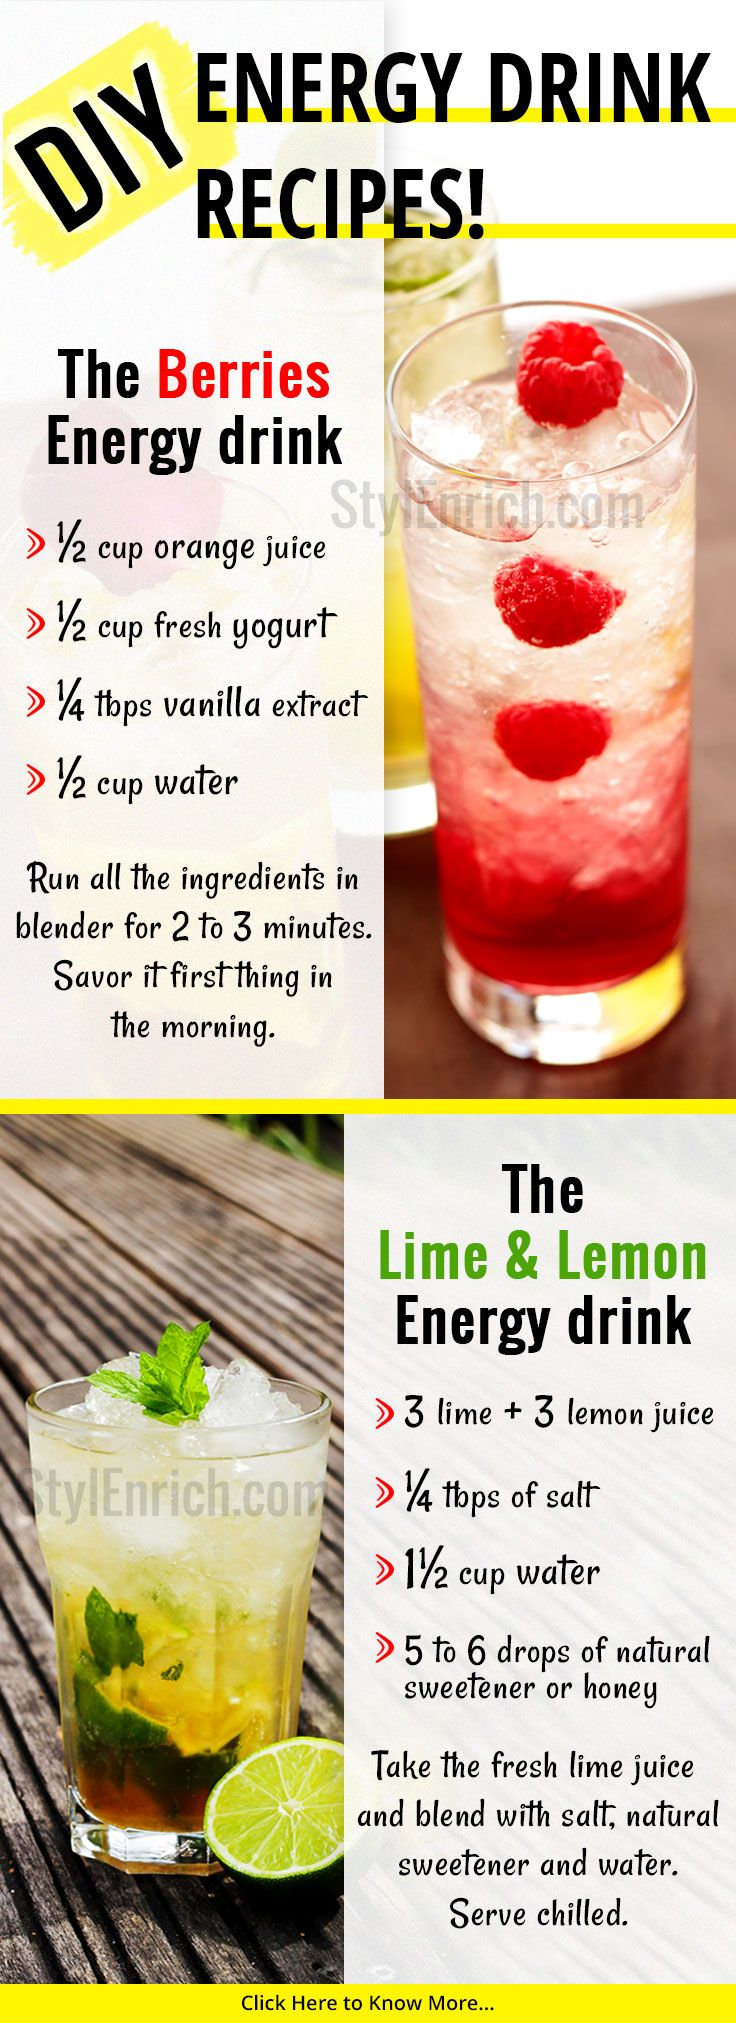 Healthy Natual Looking 19 Year Old Girl Portrait Stock: Best 25+ Energy Drinks Ideas On Pinterest